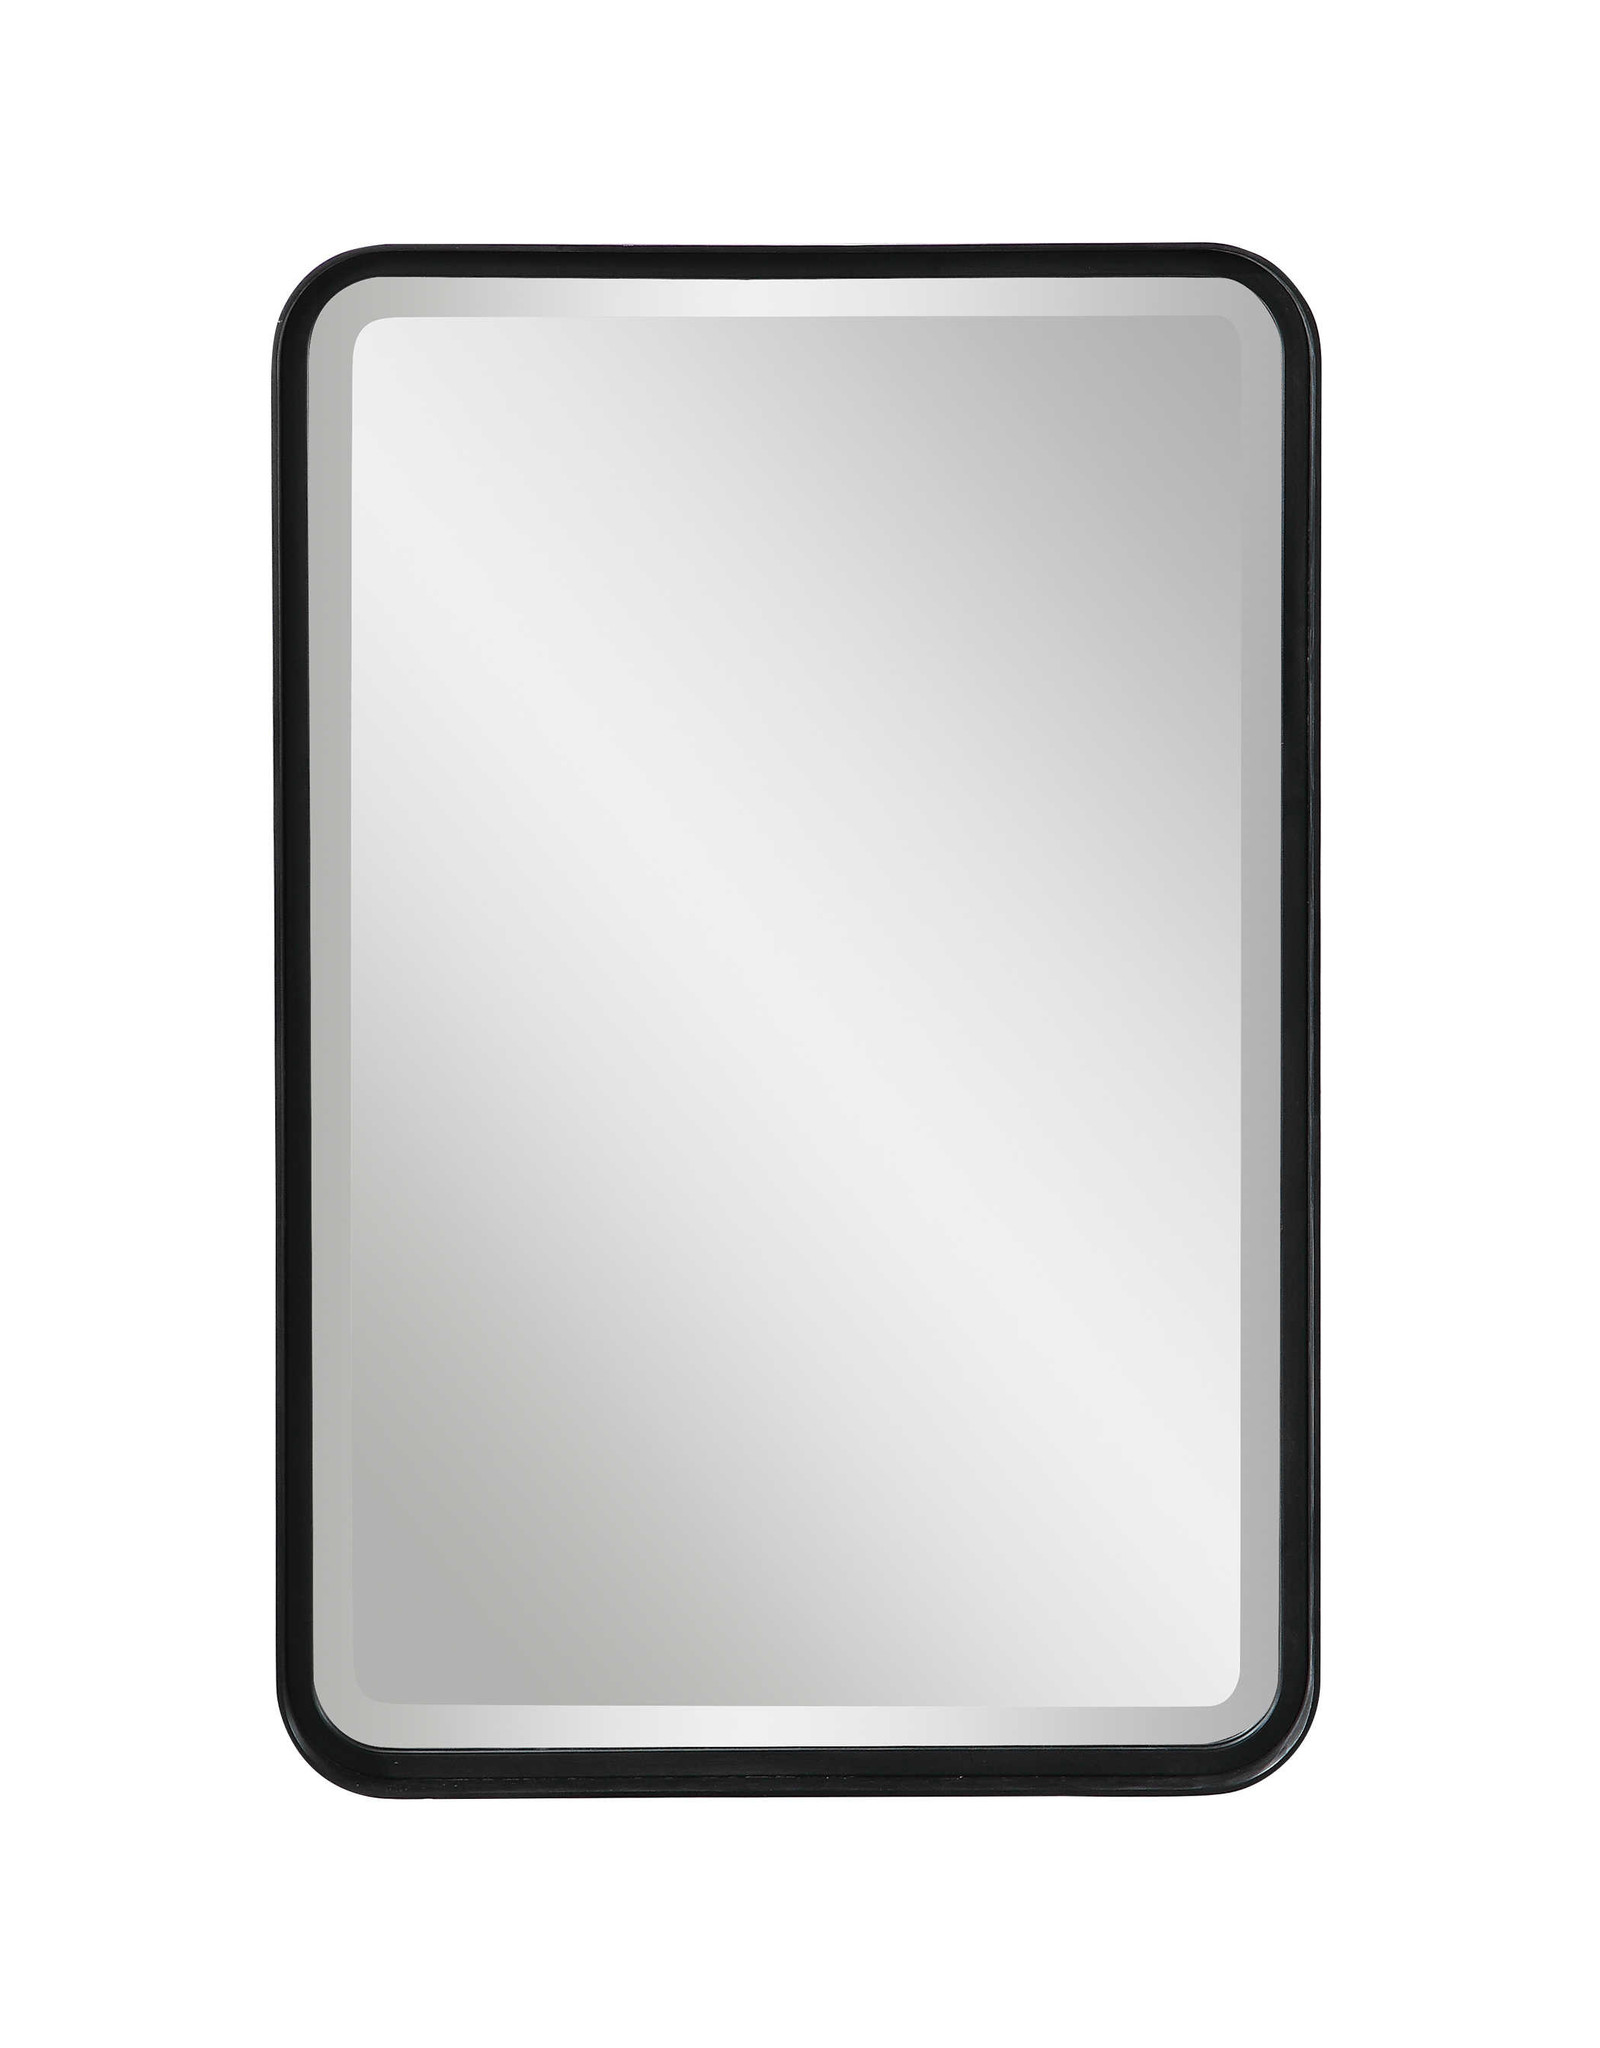 Uttermost *Crofton Black Vanity Mirror